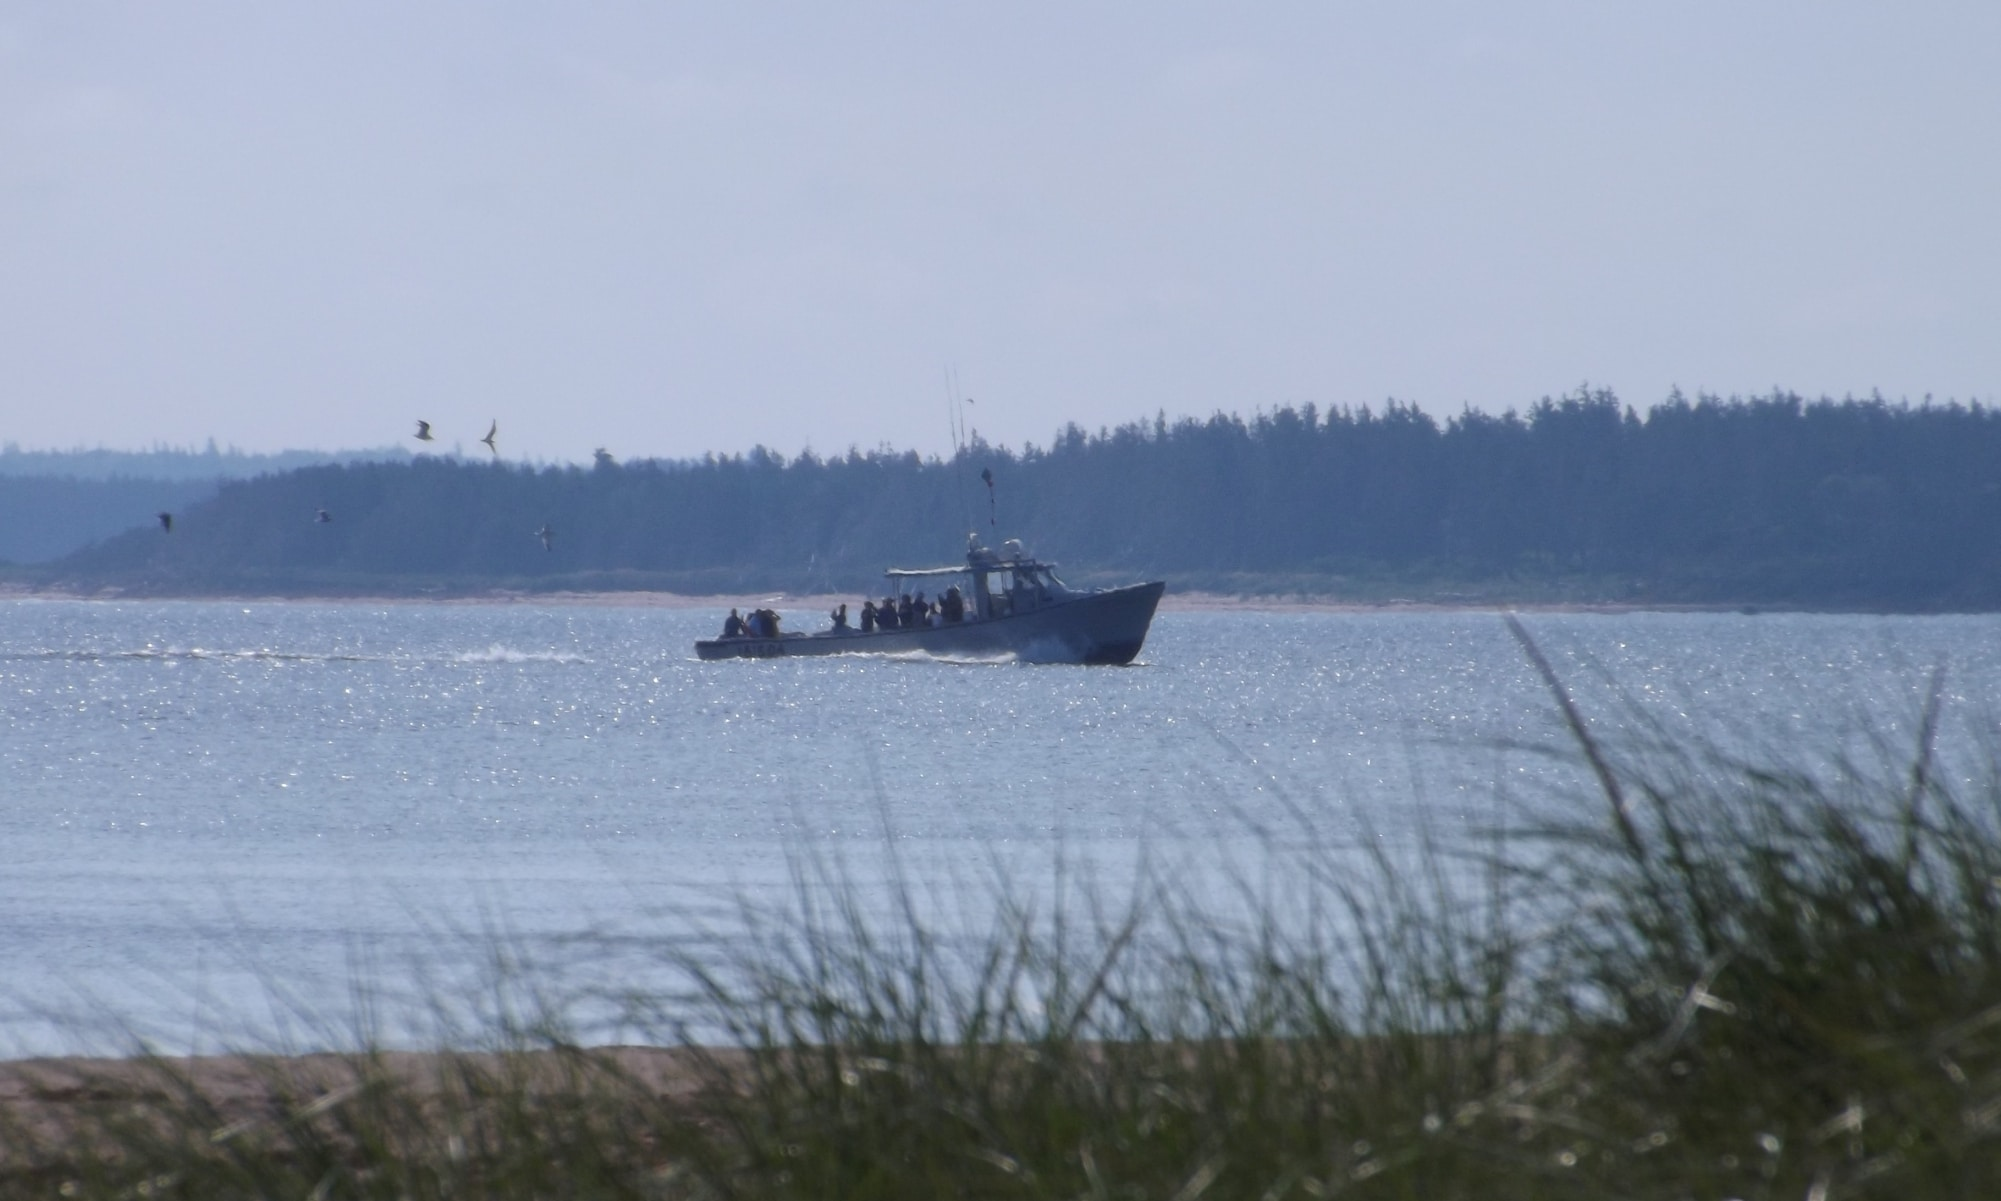 Fishing-Boat-at-North-Rustico-DSCF8352